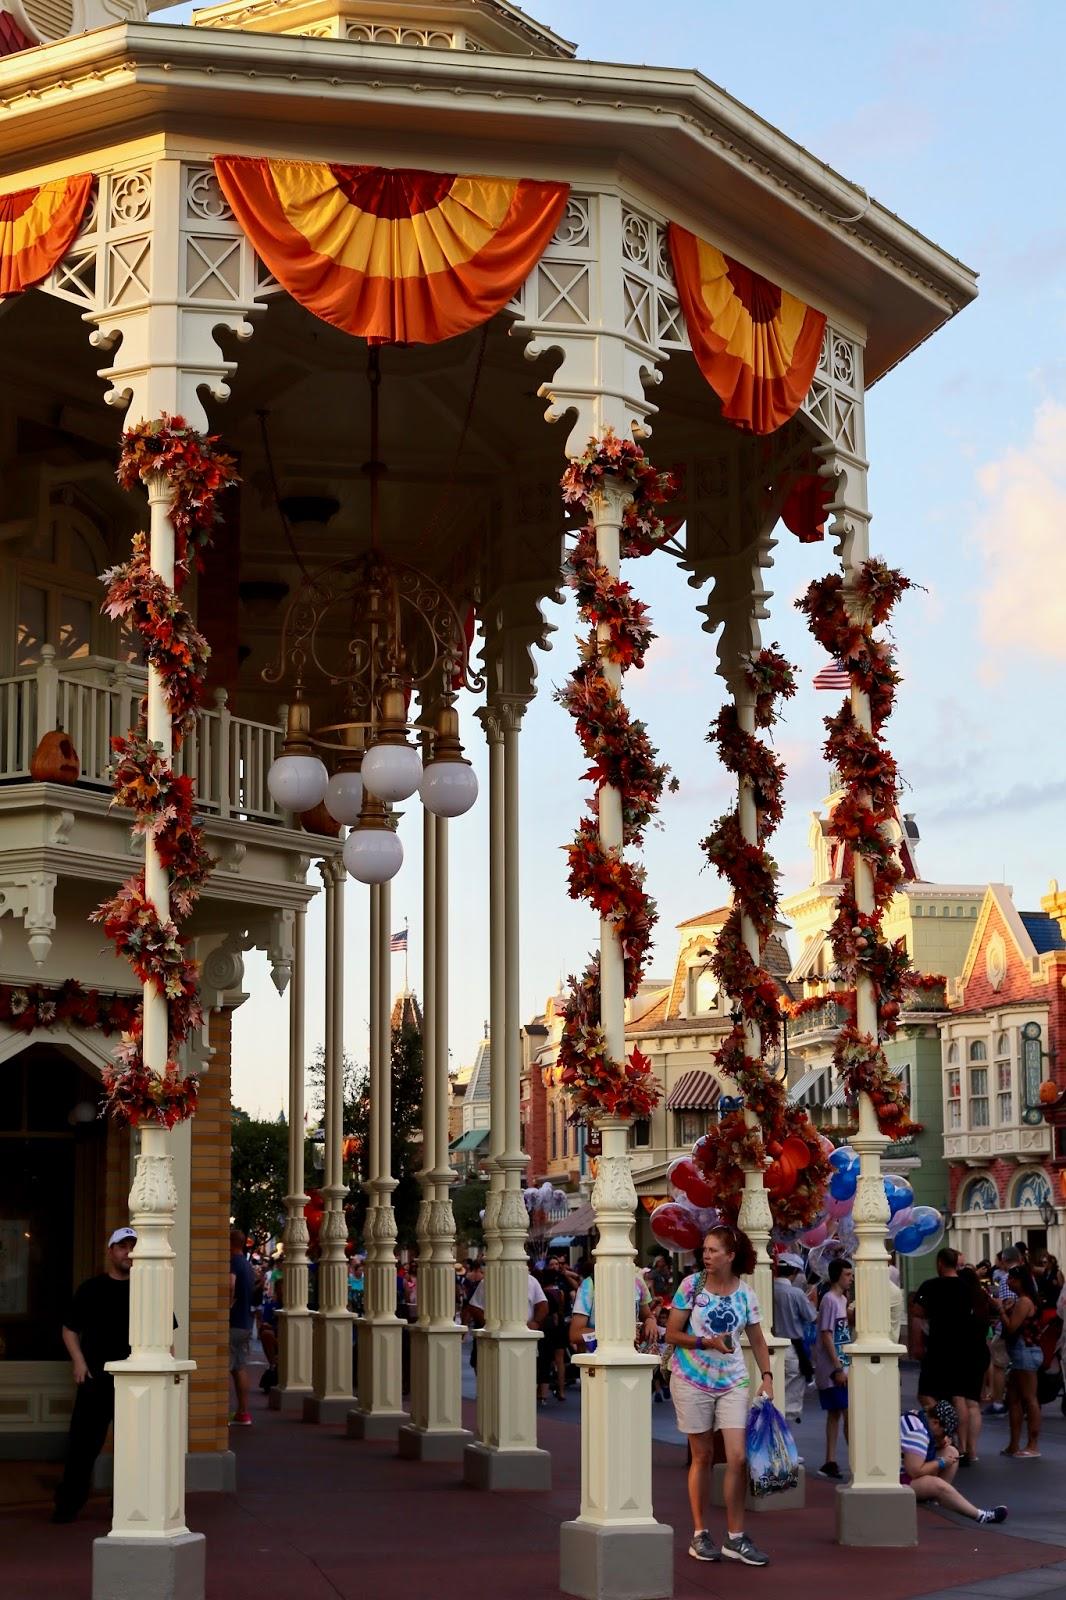 Disney-World-Magic-Kingdom-Fall-Halloween-decorations-Main-Street-USA